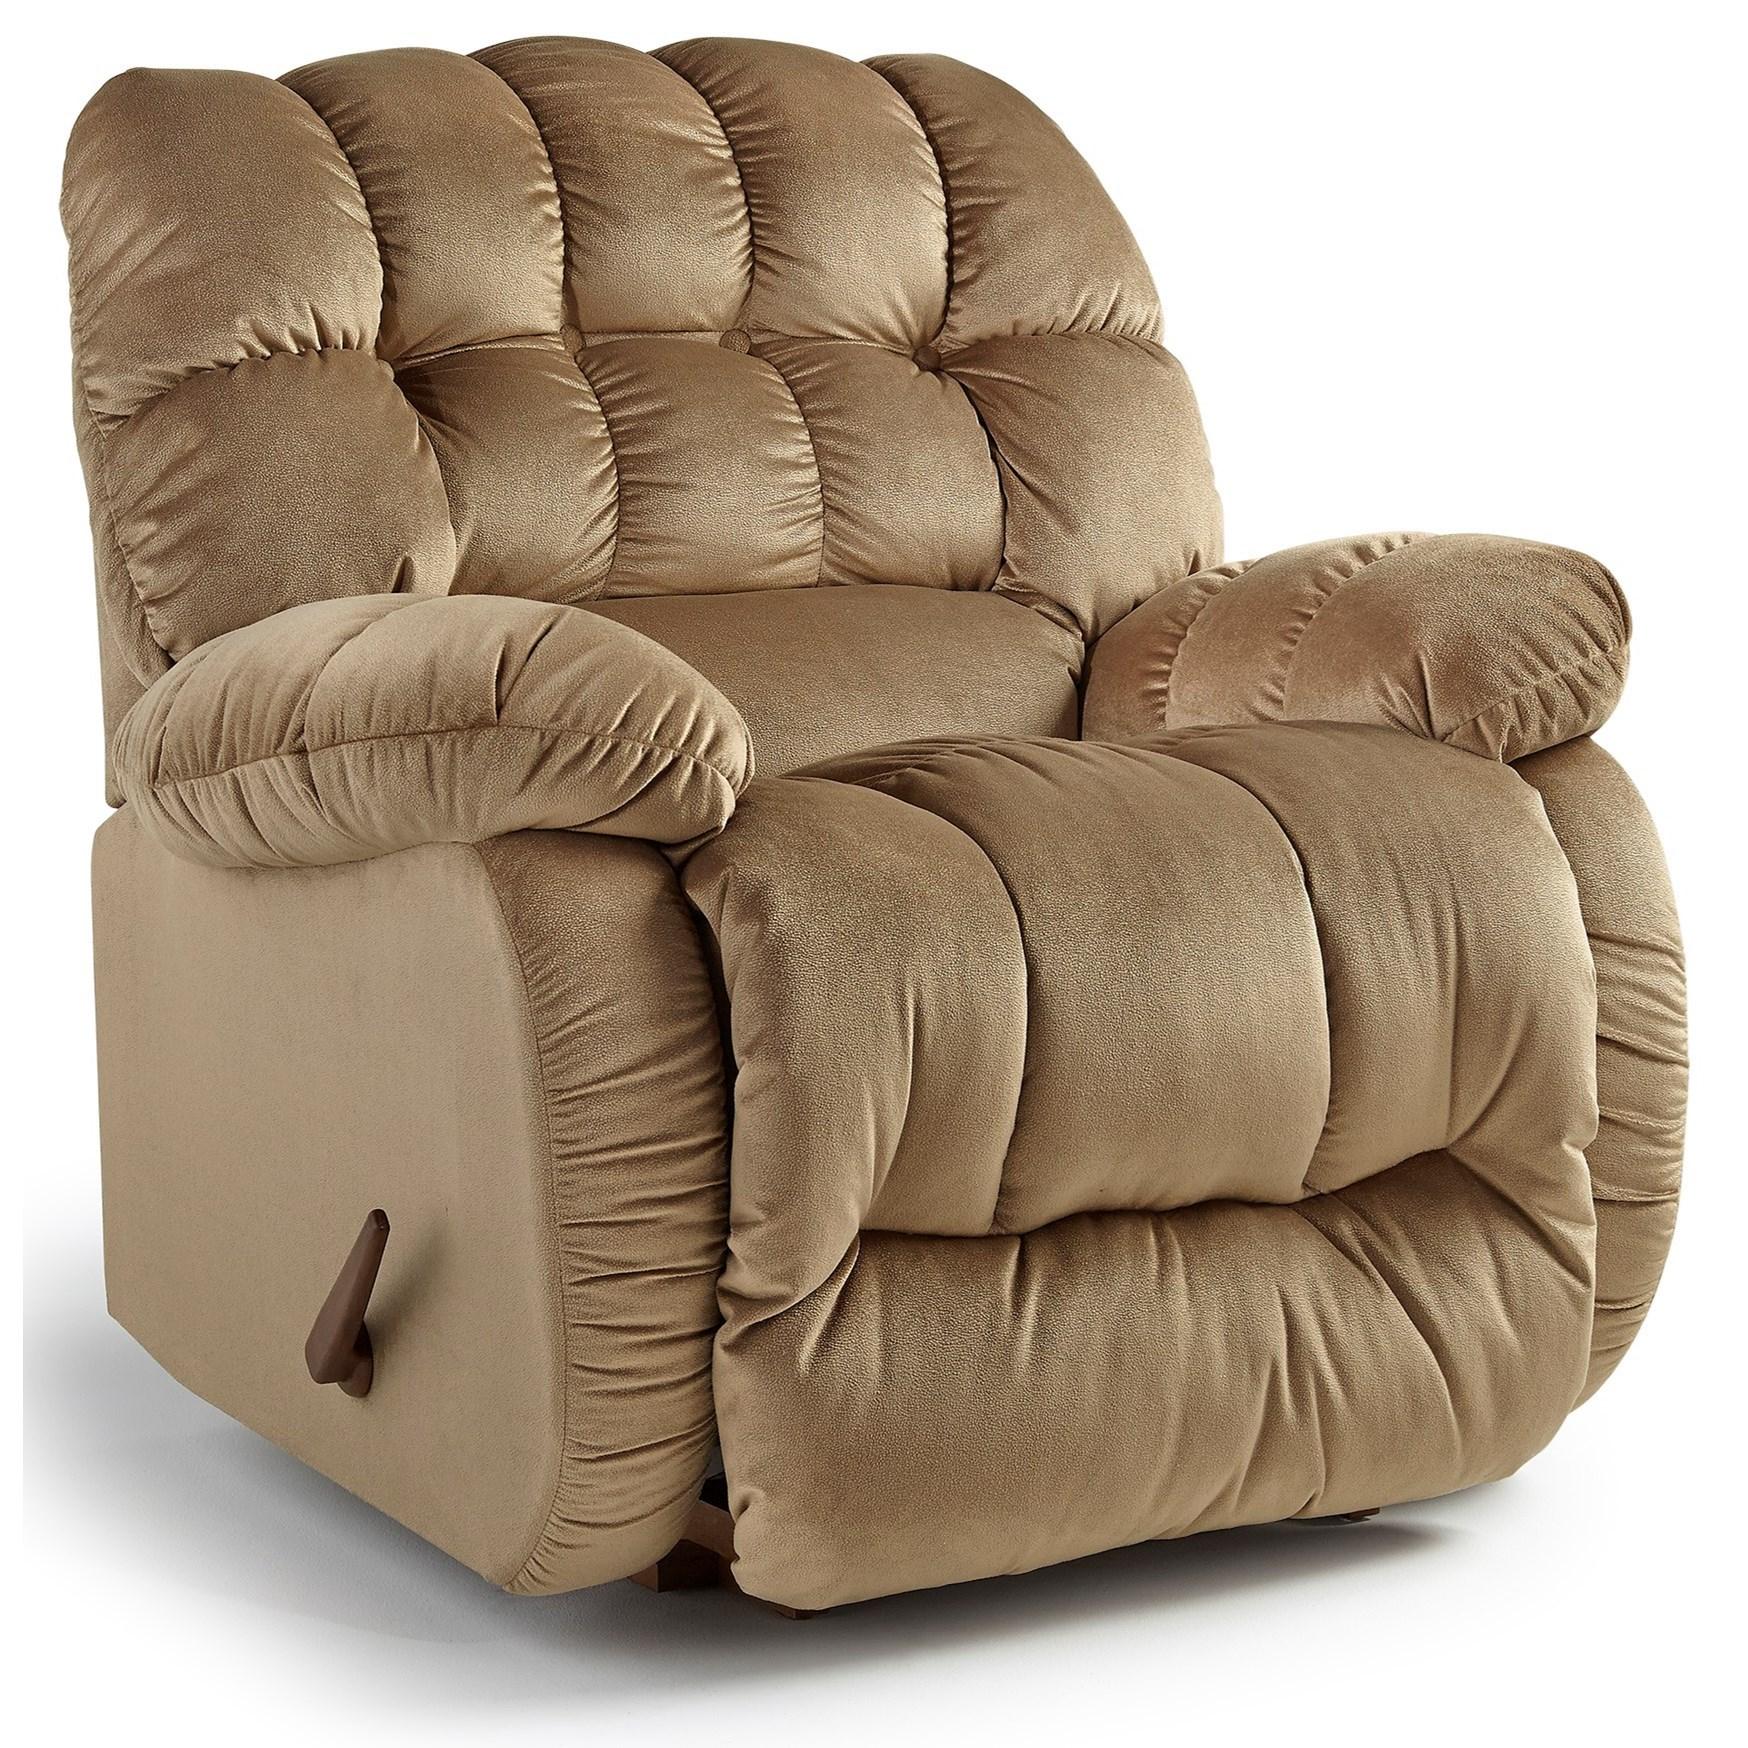 Big Man Recliners Roscoe Rocker Recliner by Best Home Furnishings at Walker's Furniture